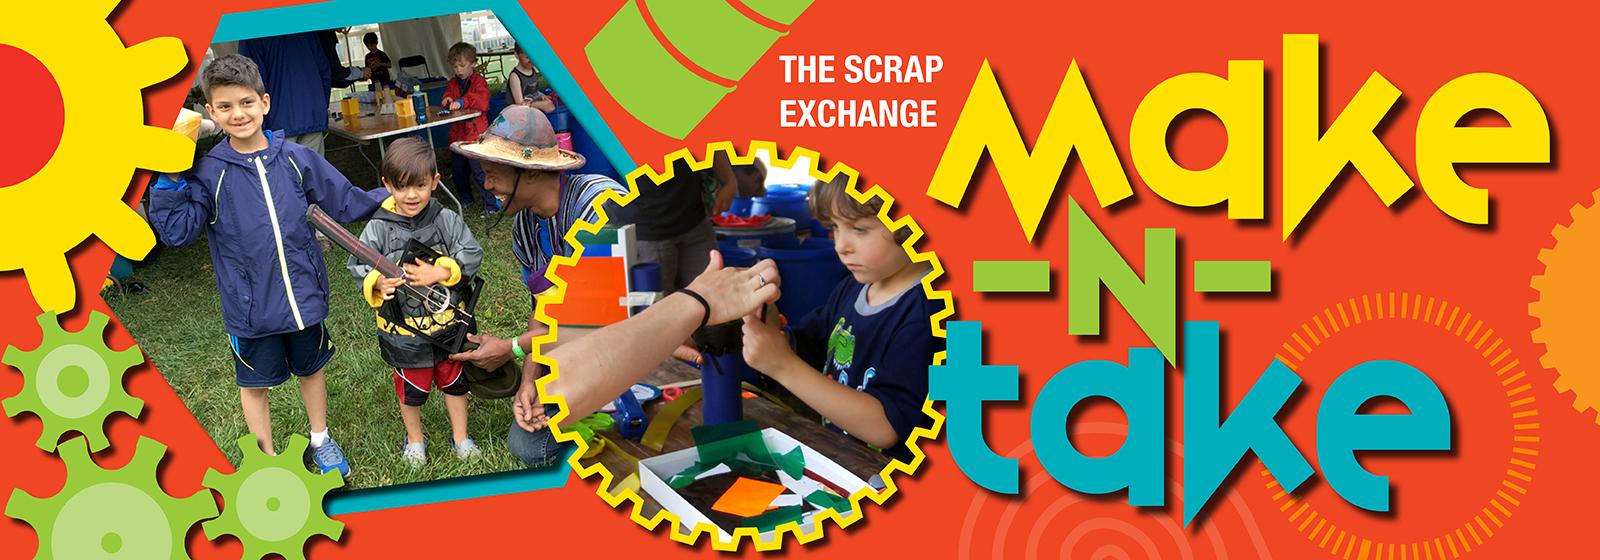 Make-N-Take - Scrap Exchange